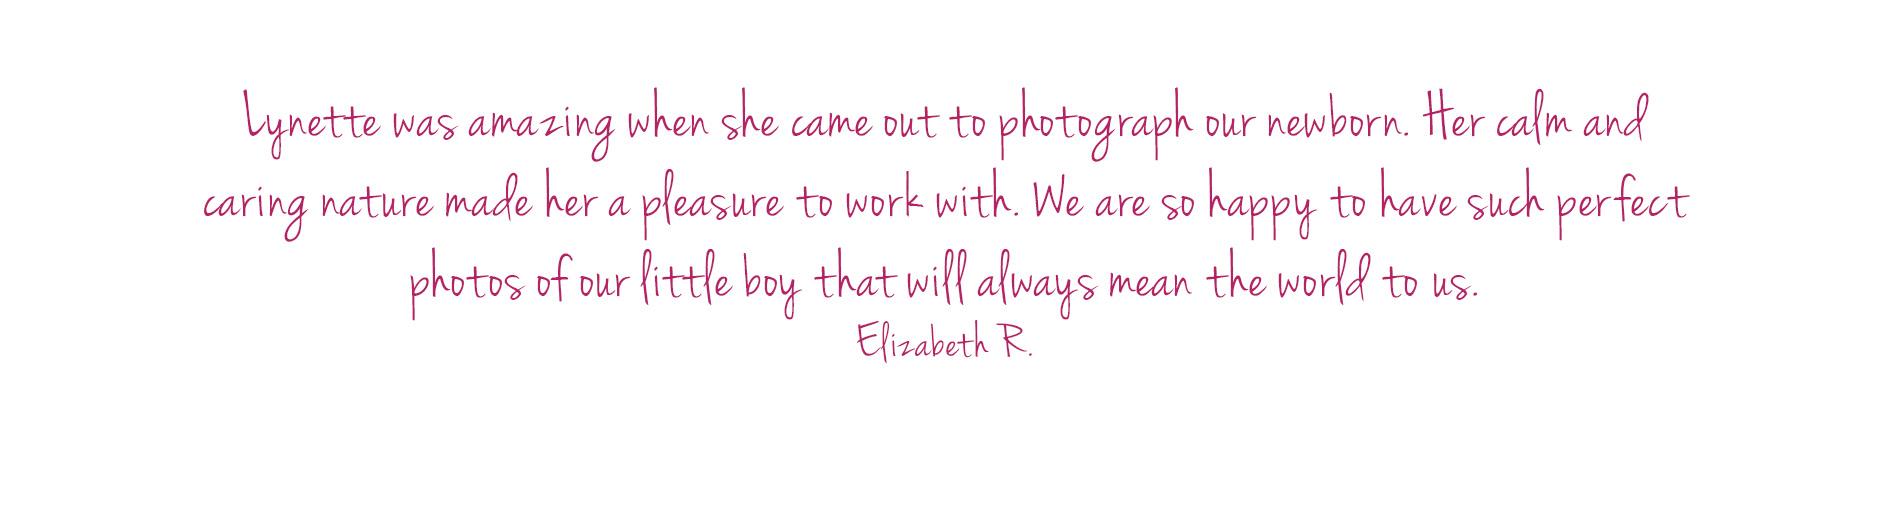 testimonial-elizabethroberts.jpg